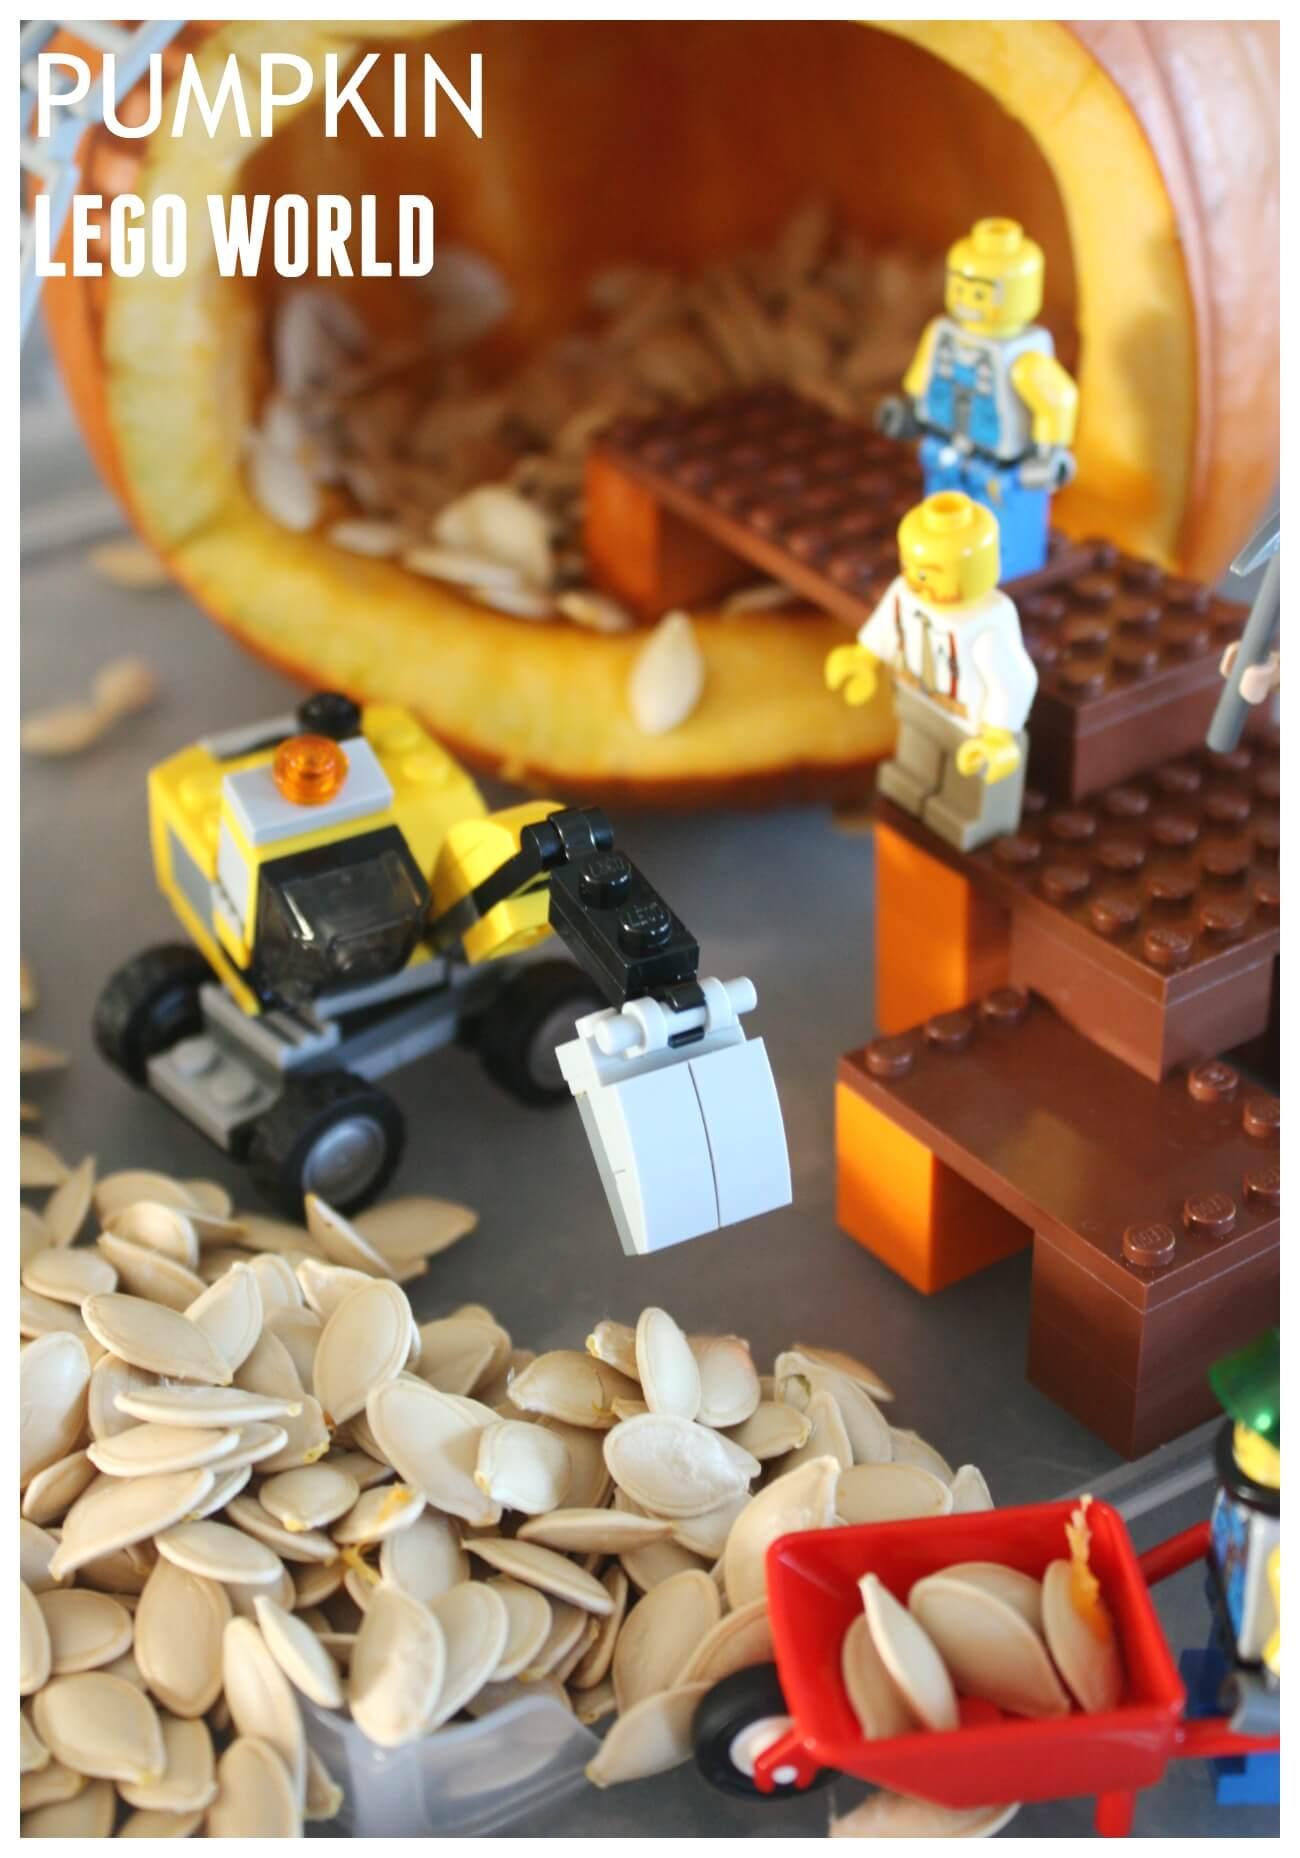 Pumpkin Play Fall Stem Pumpkin Lego Small World